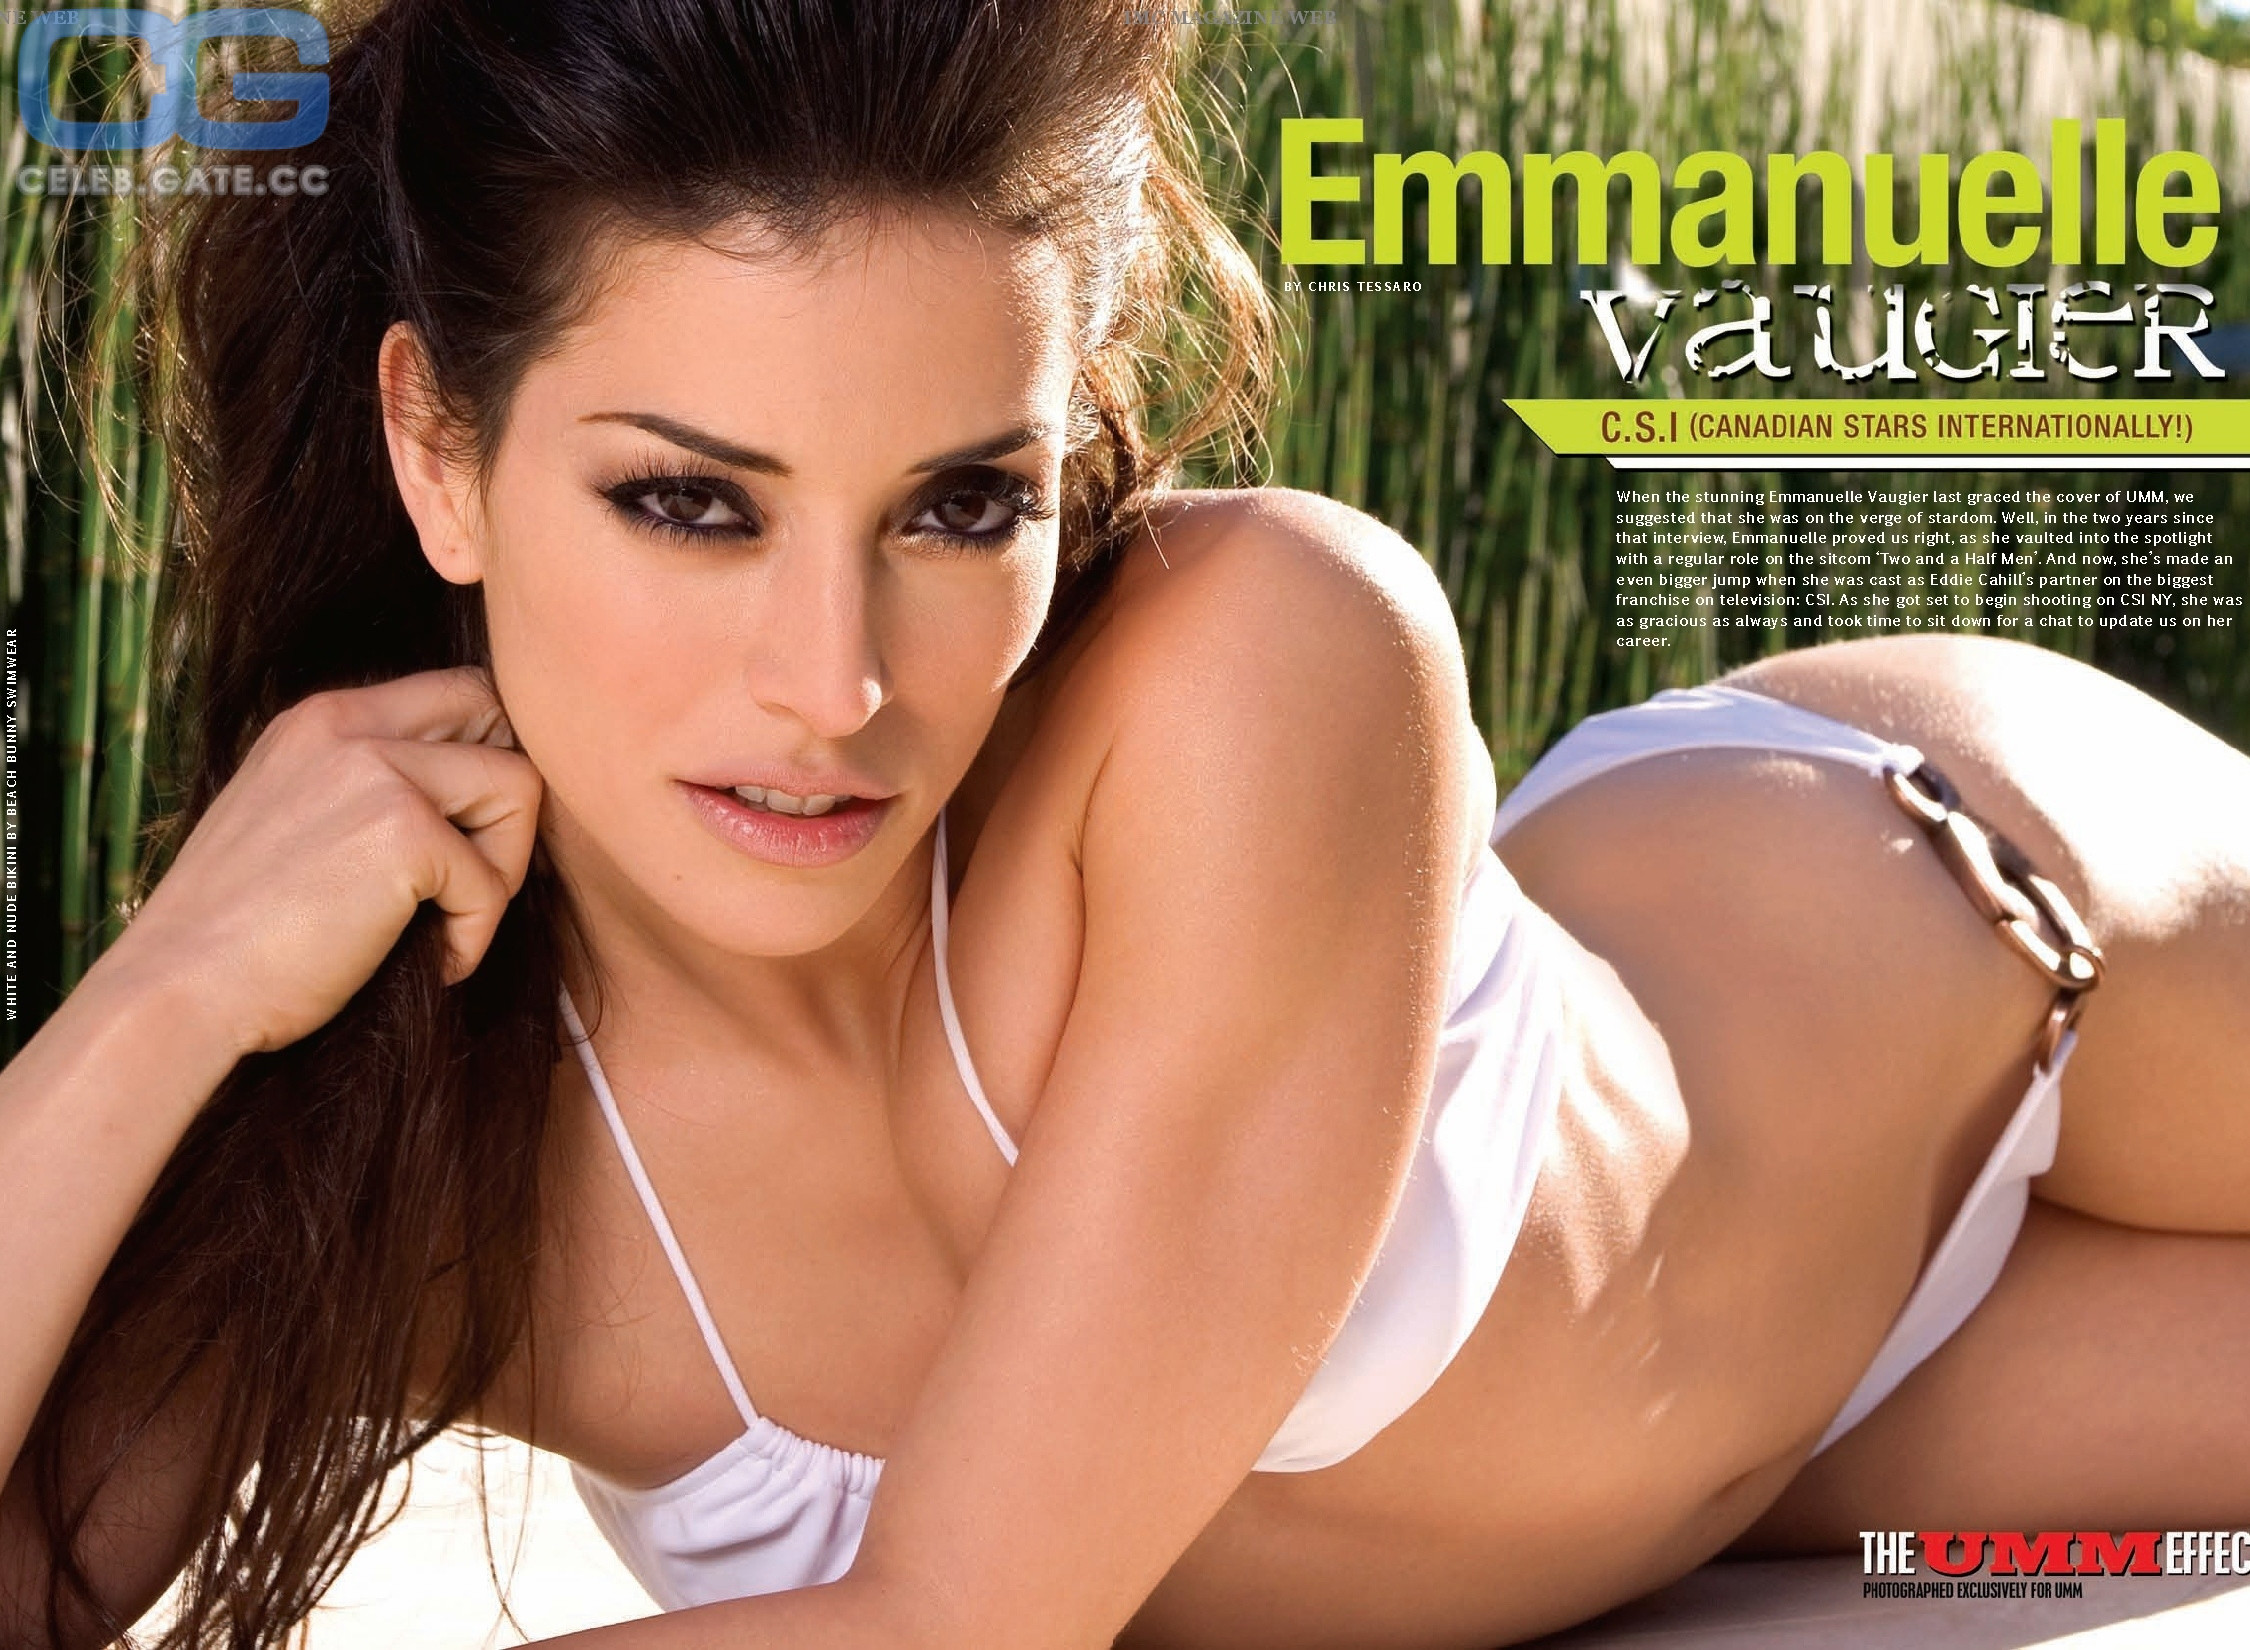 Vaugier nackt Emmanuelle  Emmanuelle Vaugier